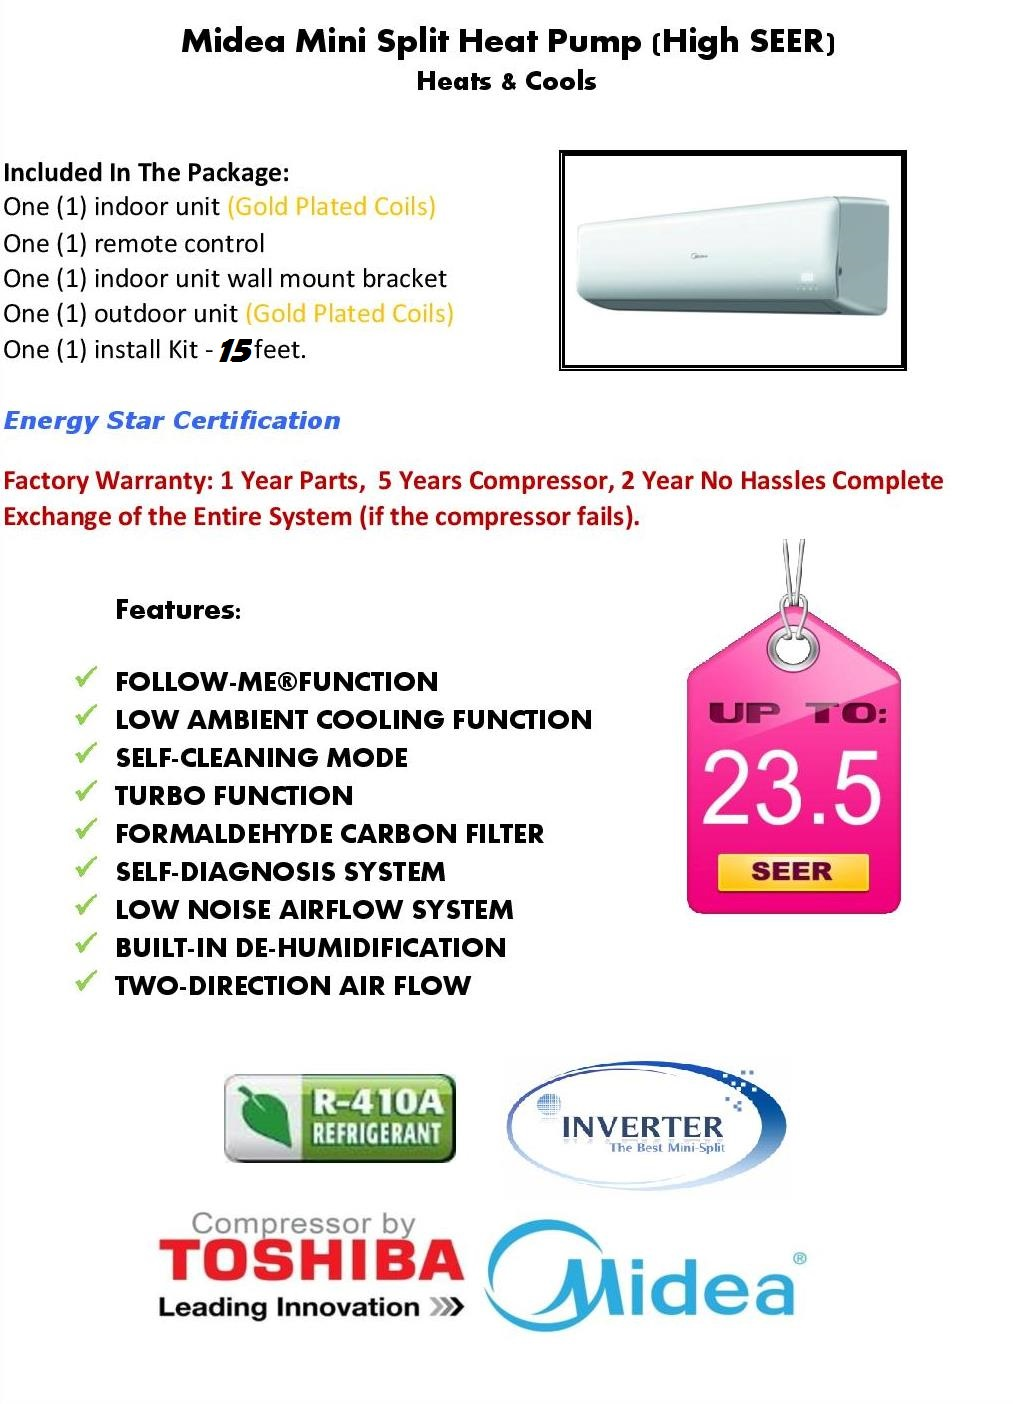 get a midea 24000 btu 19 seer super inverter mini split heat pump ac price [ 1013 x 1404 Pixel ]